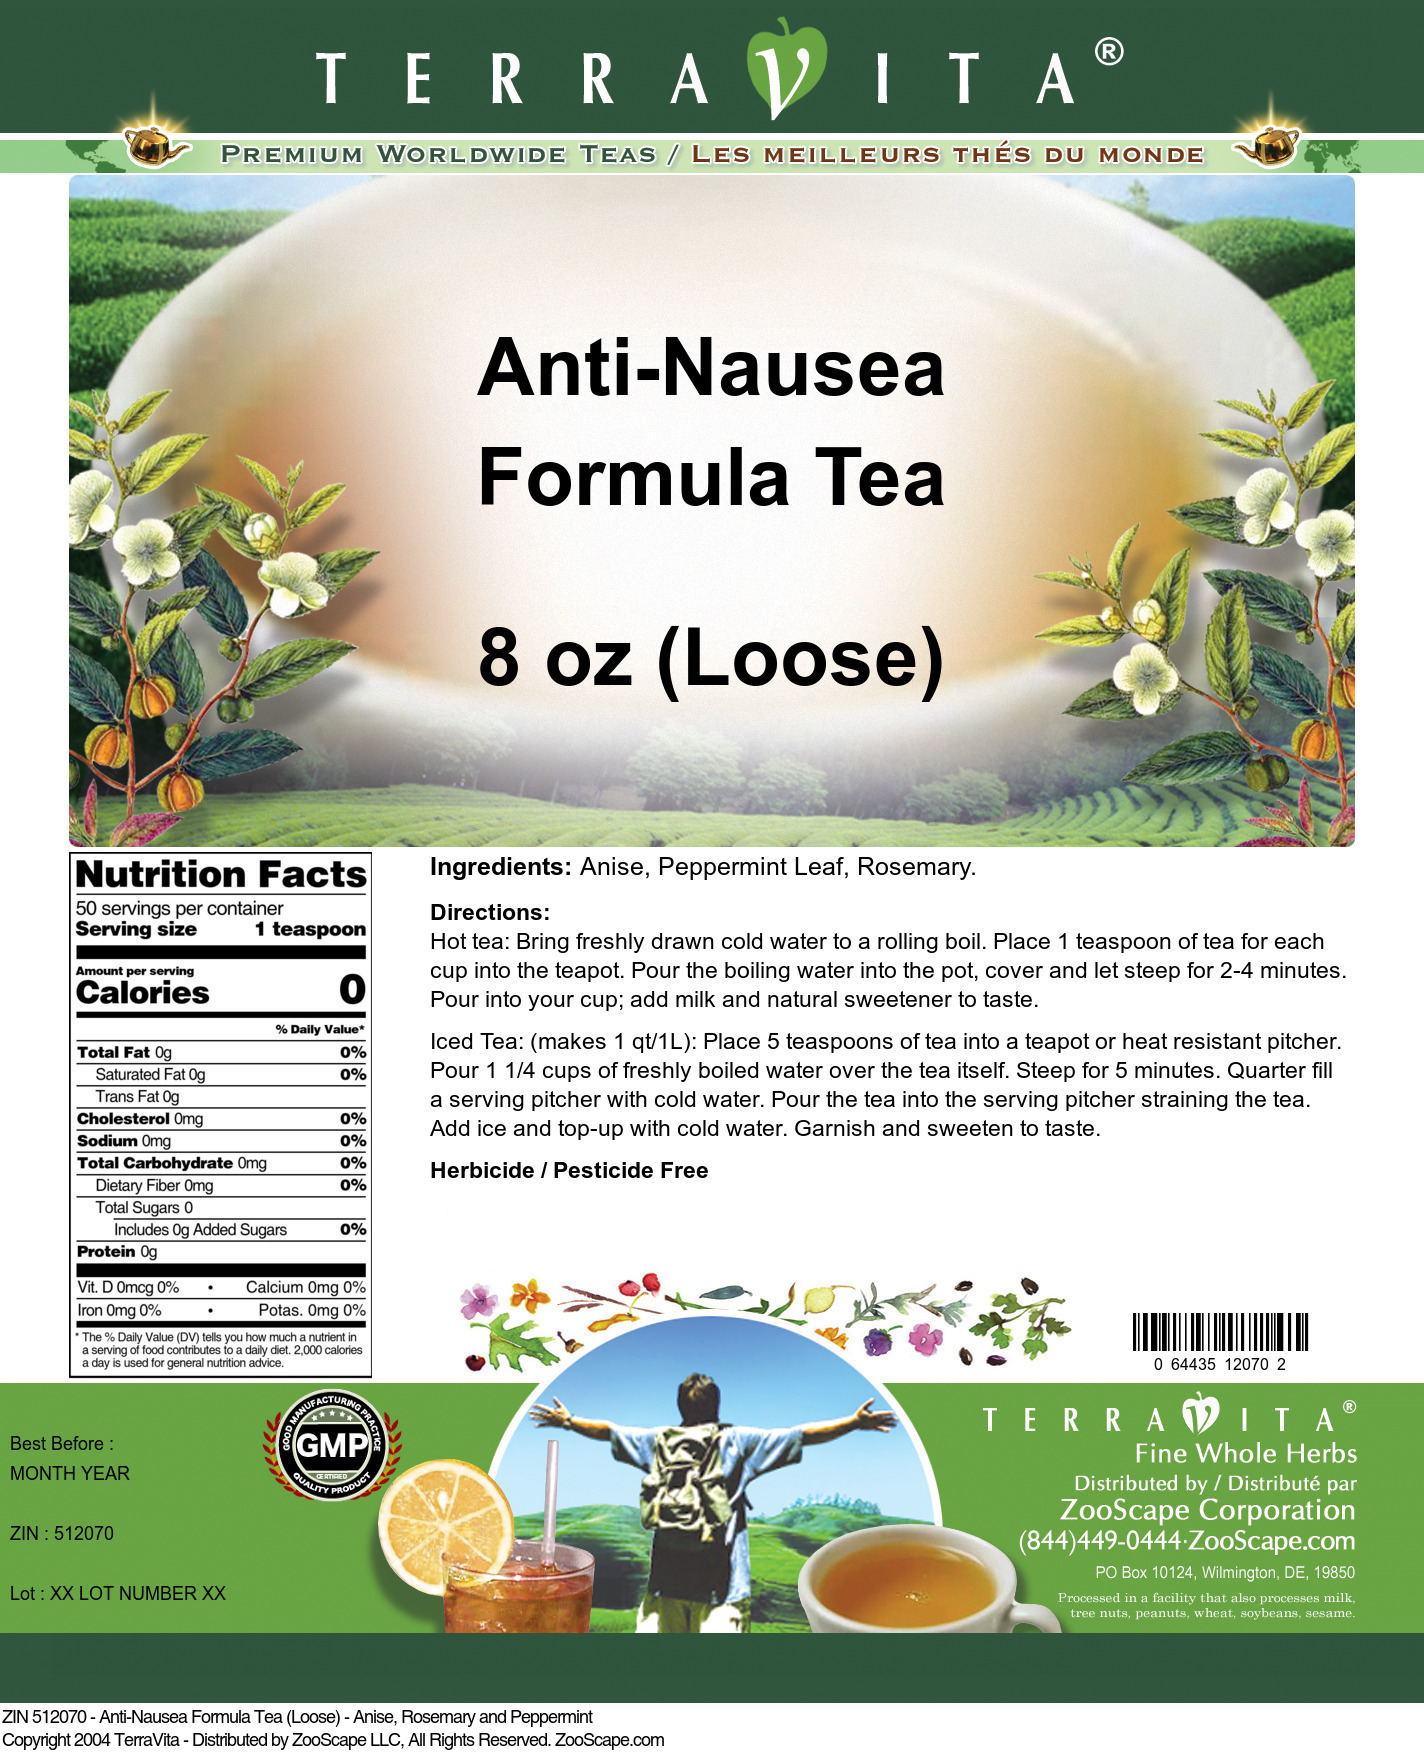 Anti-Nausea Formula Tea (Loose) - Anise, Rosemary and Peppermint